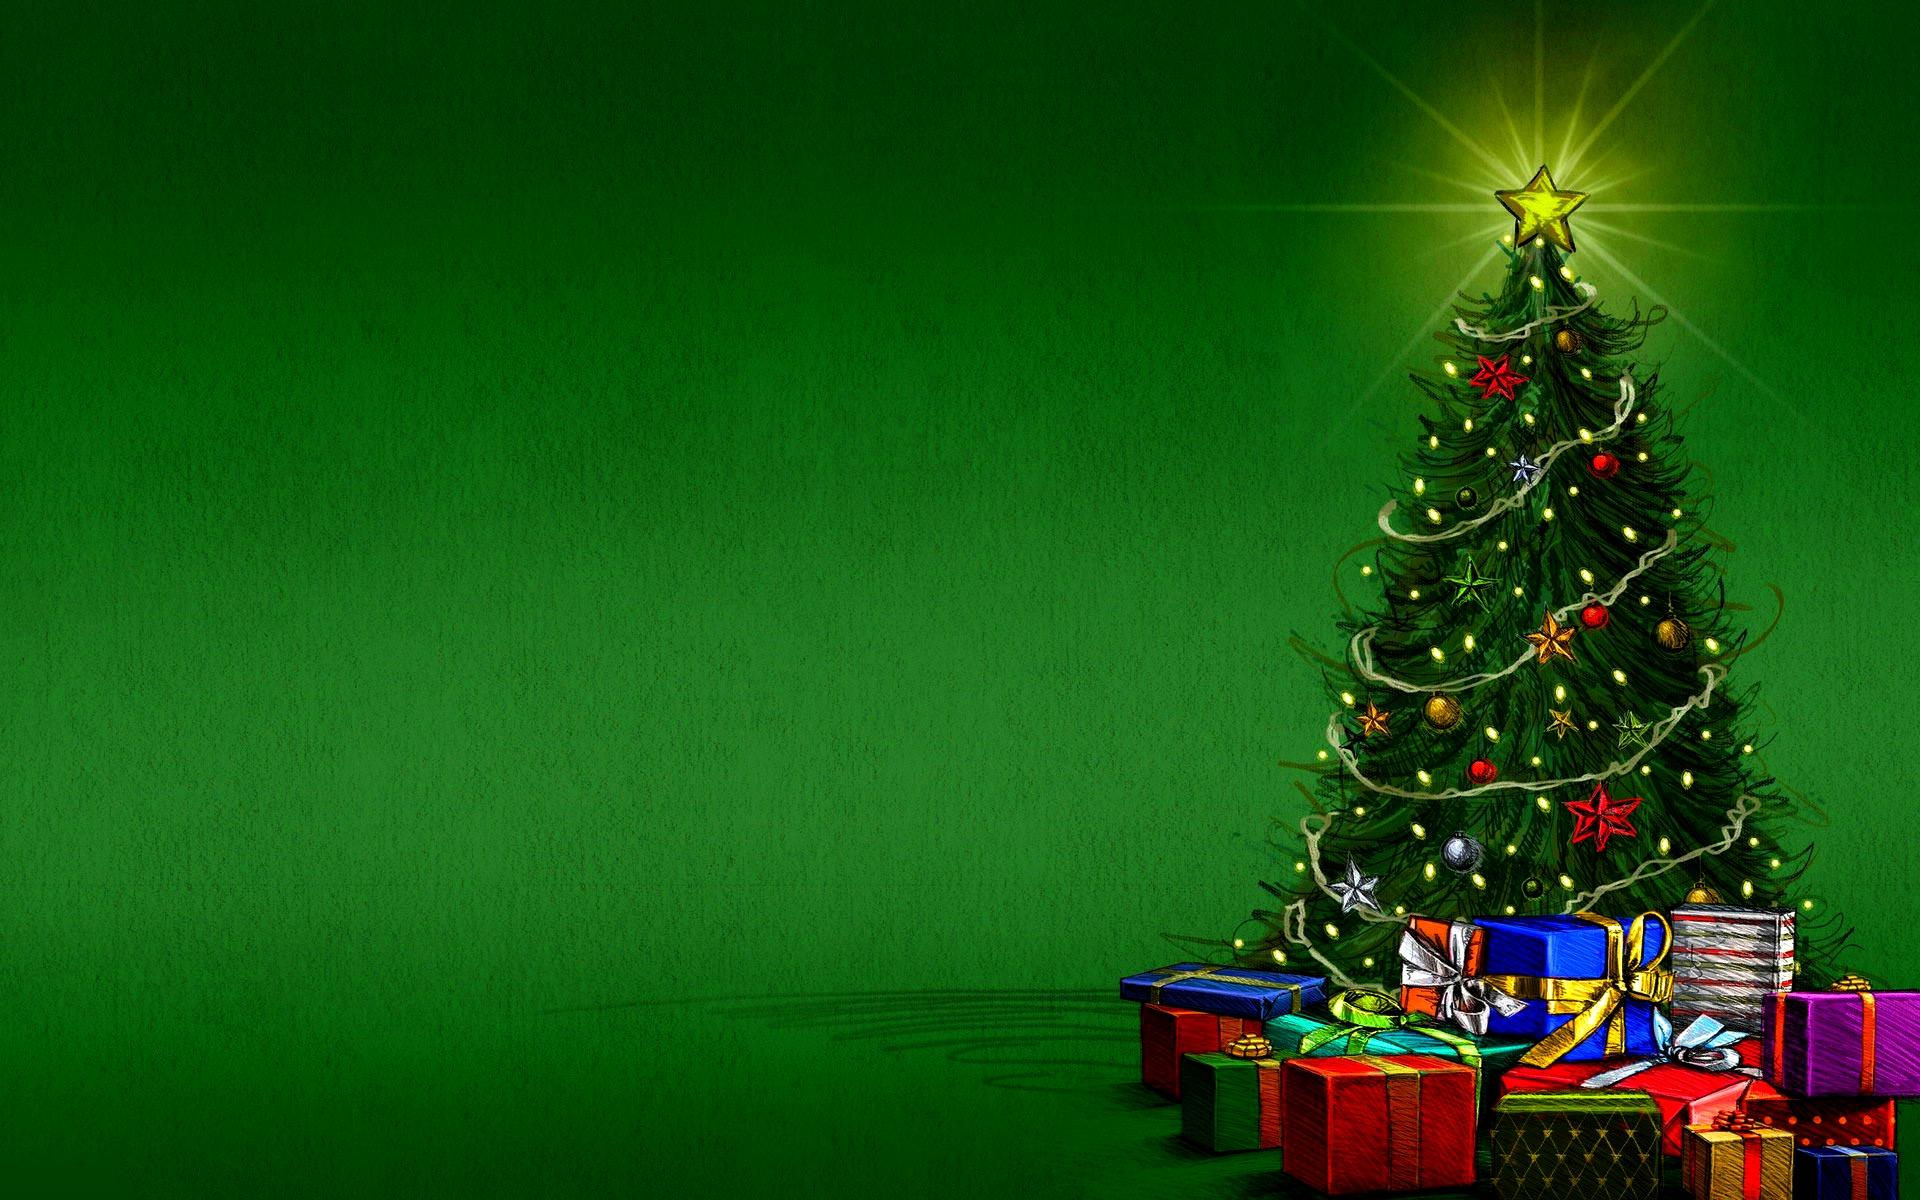 Fondos De Pantalla Navidenos Gratis: Descargar Arbol De Navidad Animado Para Pc